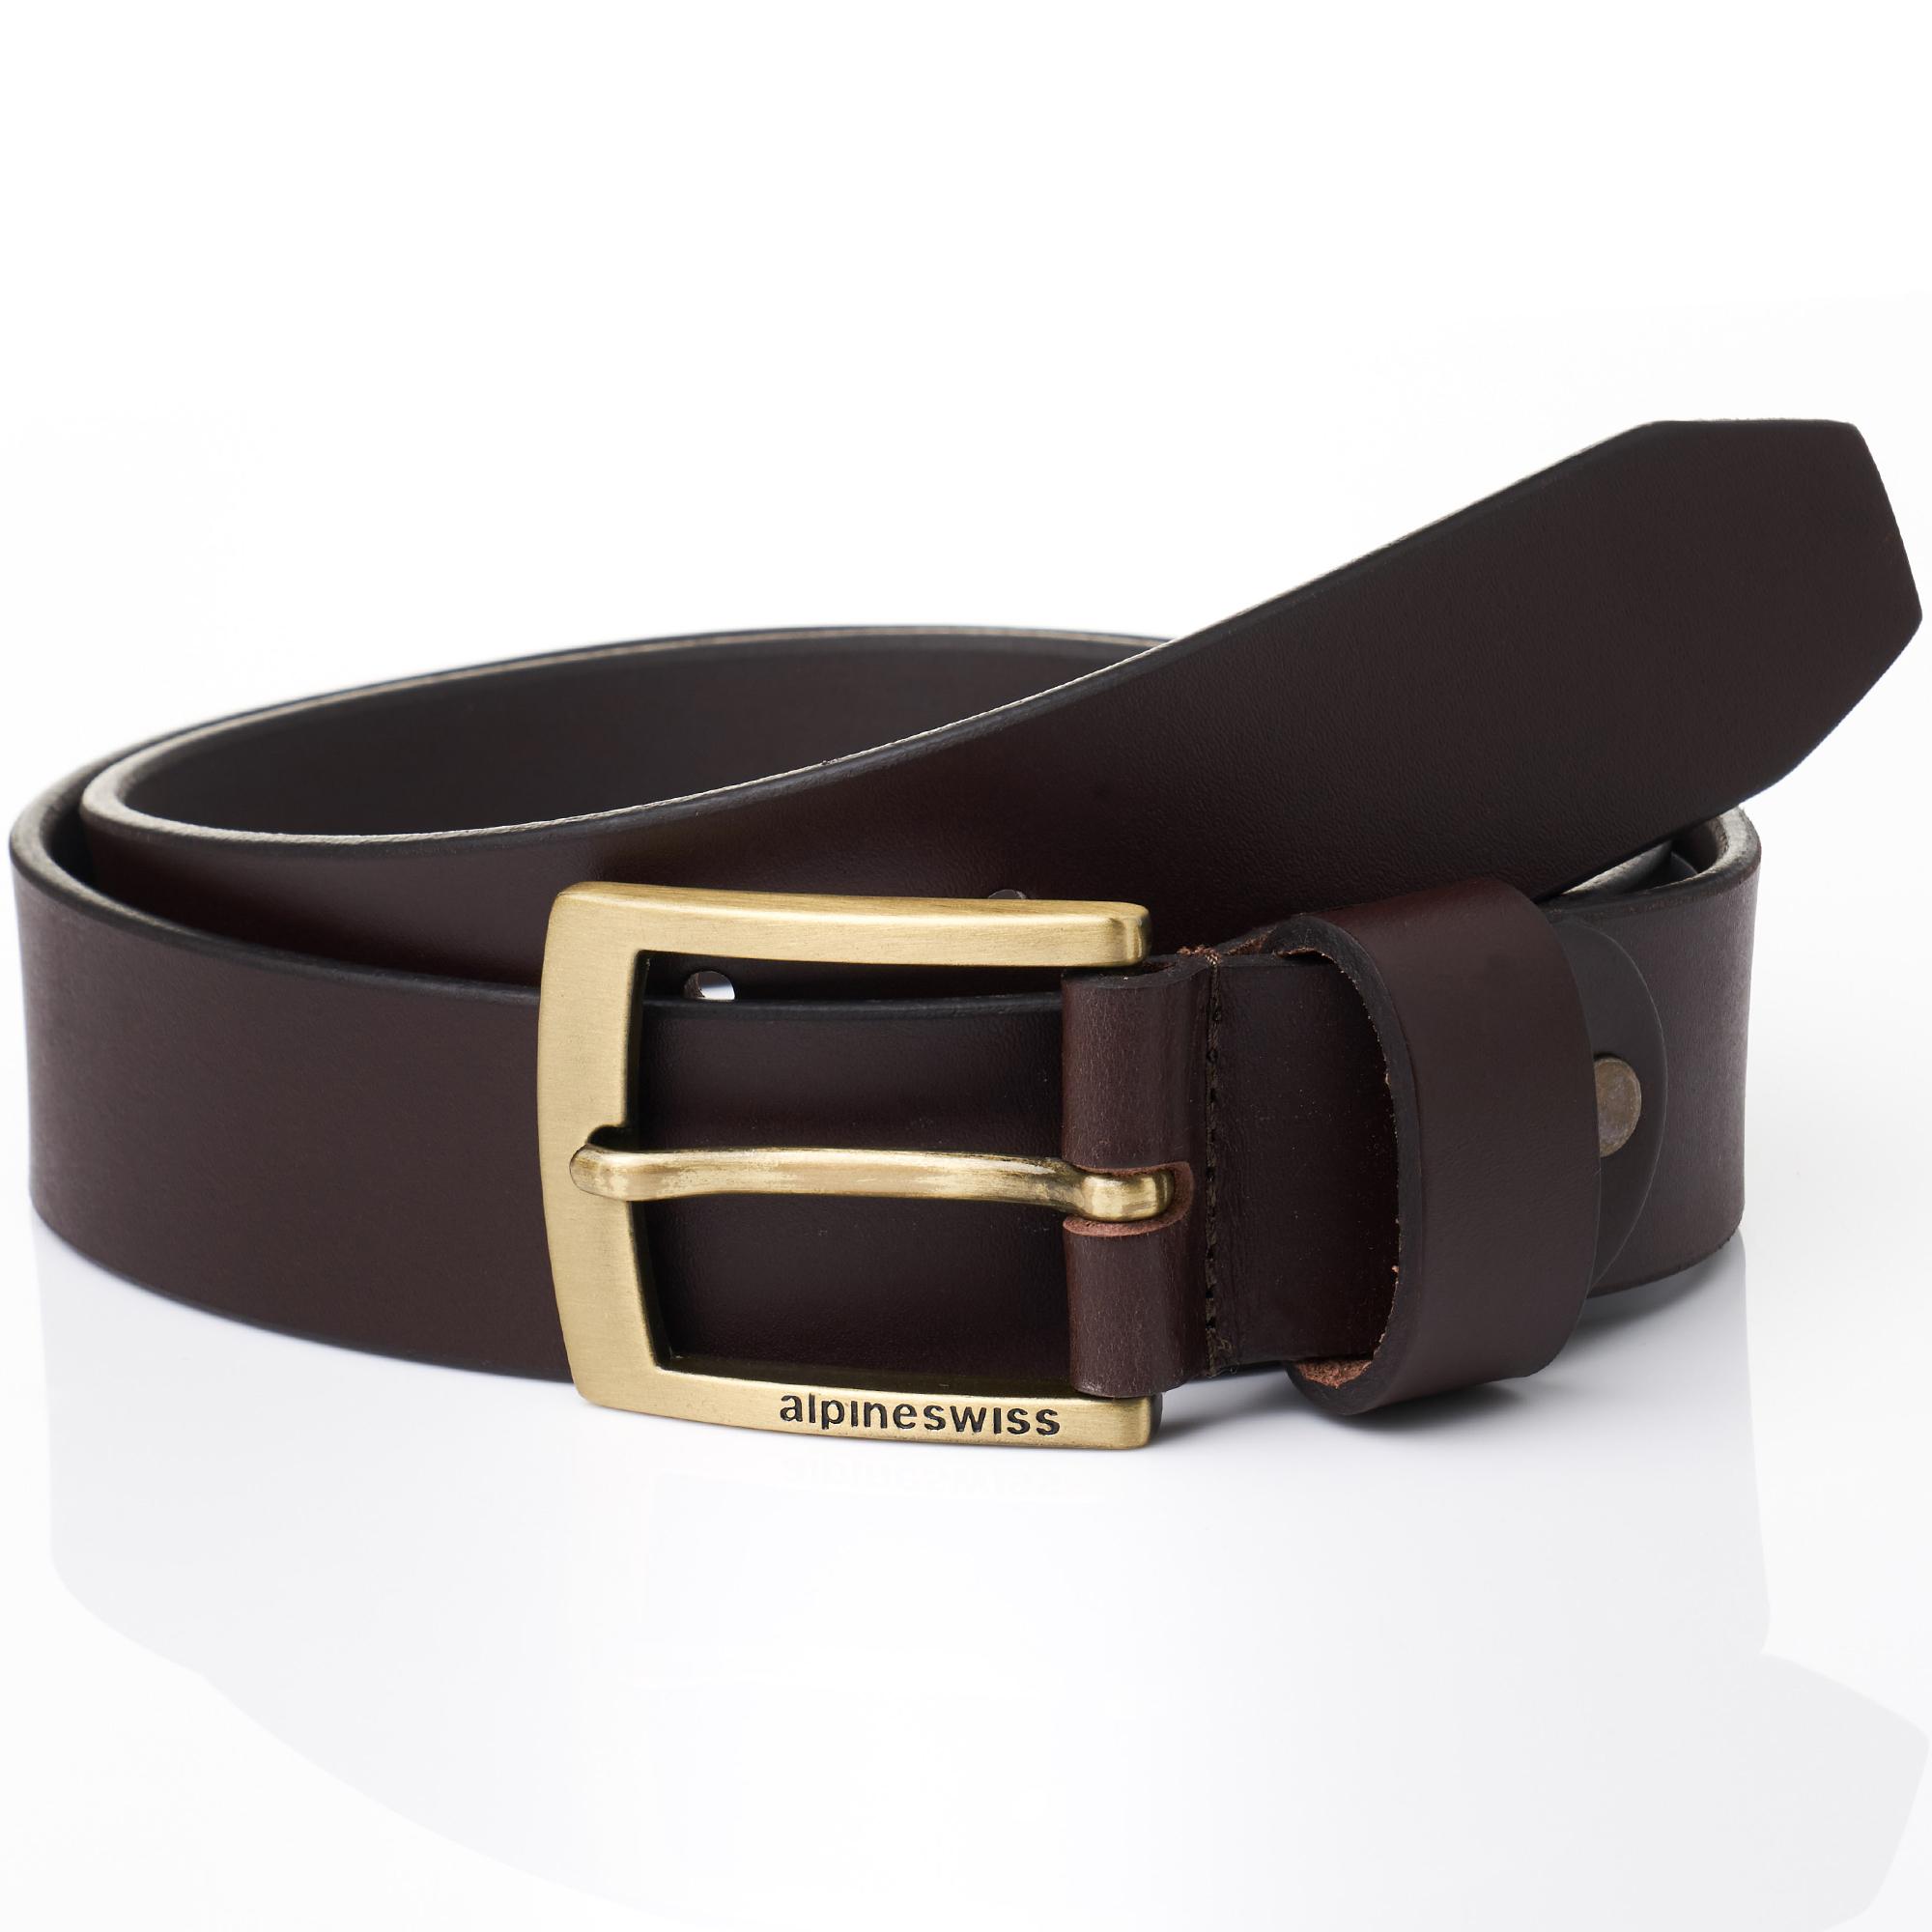 Alpine-Swiss-Mens-Leather-Belt-Slim-1-1-4-Casual-Jean-Dakota-Signature-Buckle thumbnail 18